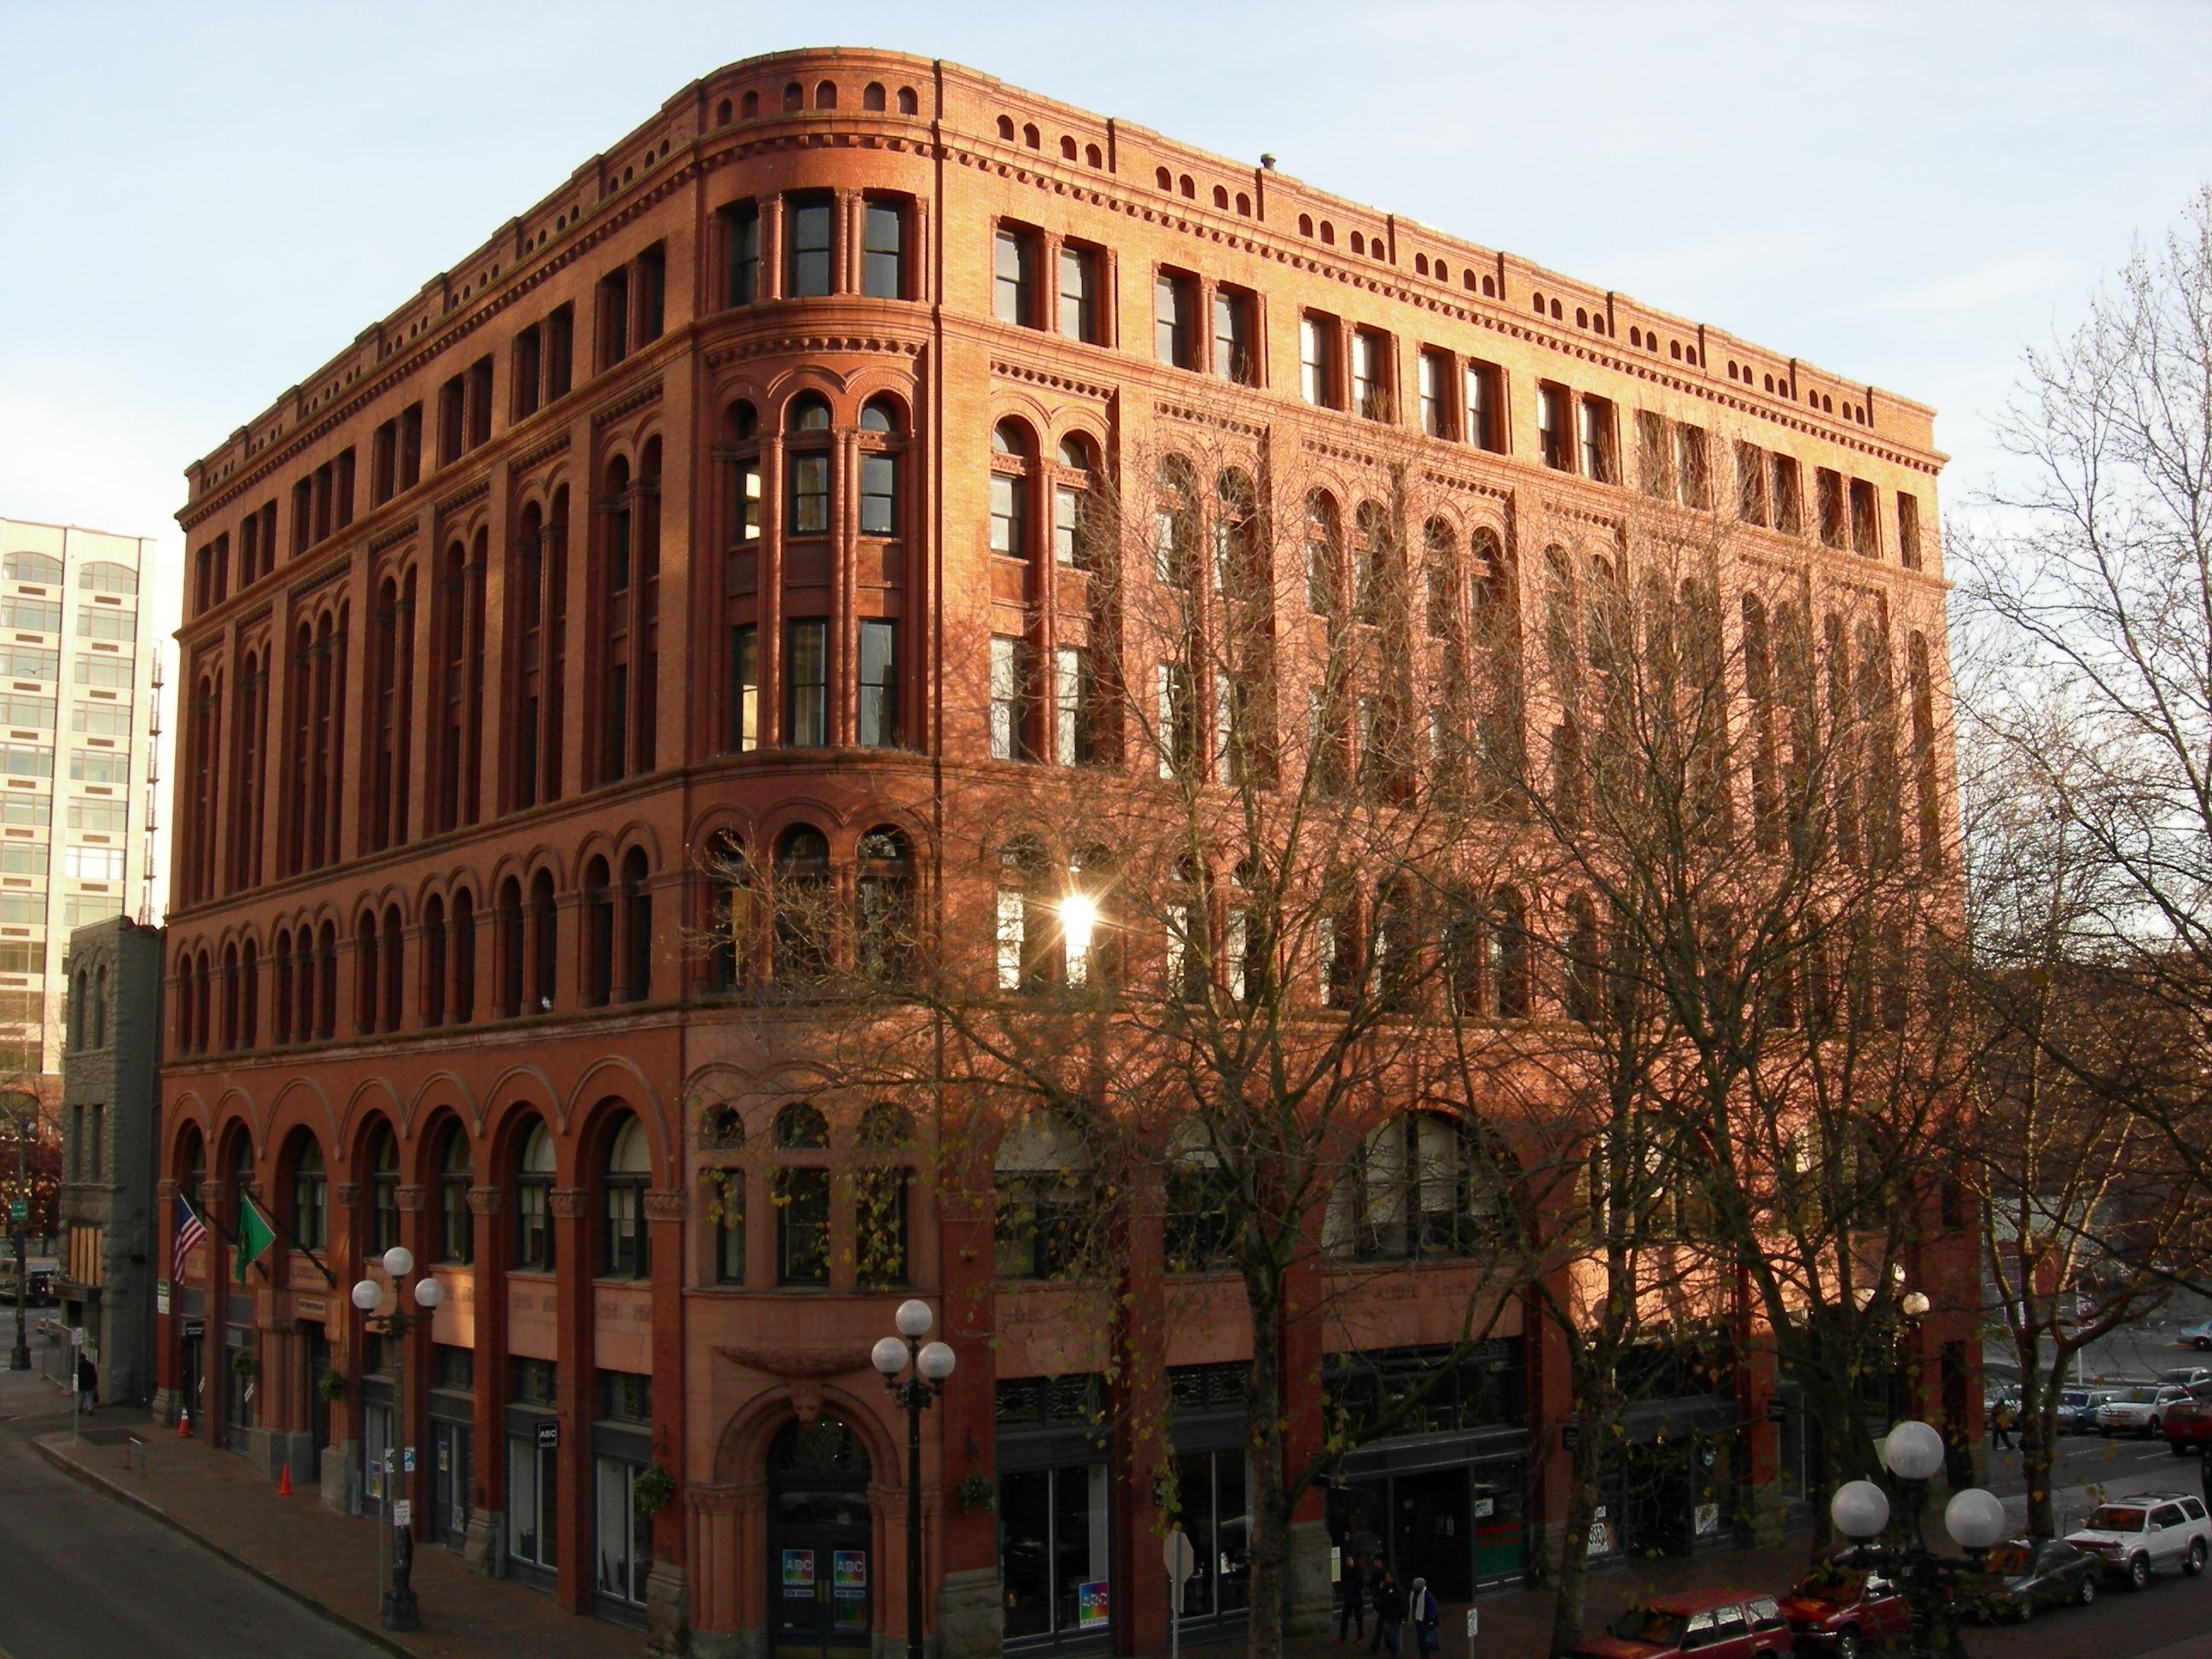 The Interurban Building 2007